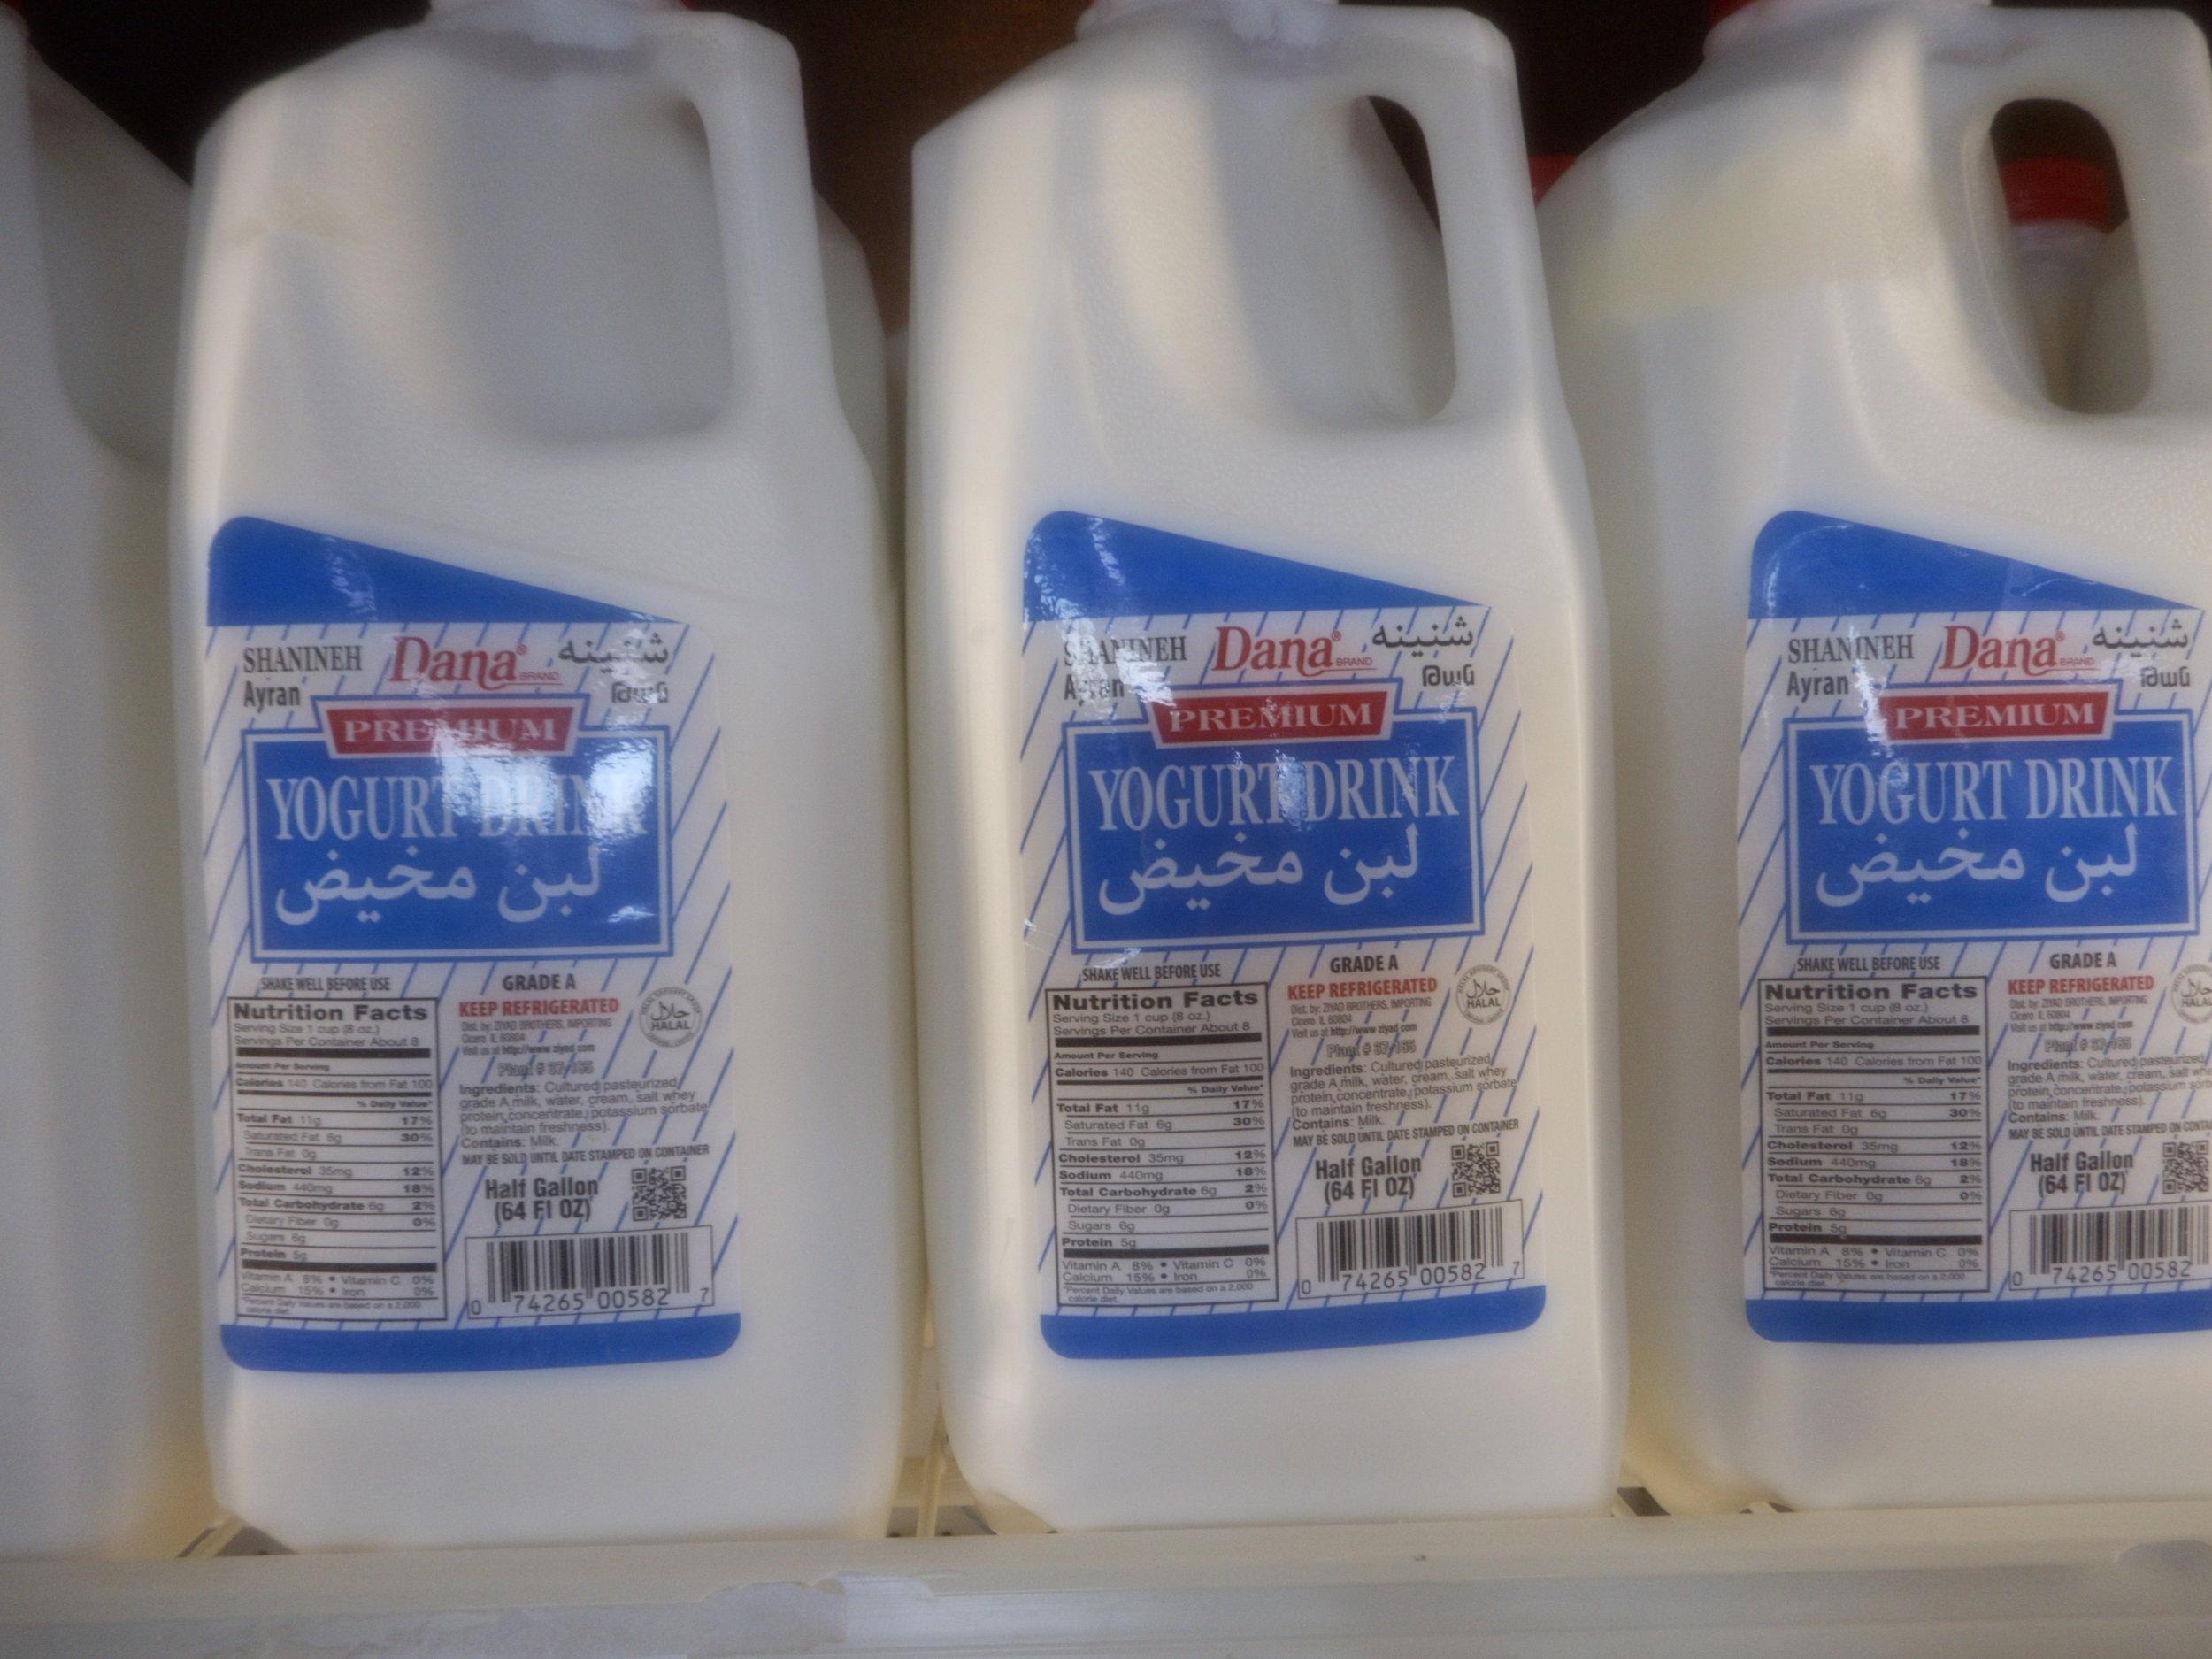 Yogurt-Drink-Pak-Halal-Mediterranean- Grocery-Store-12259-W-87th-St-Pkwy-Lenexa-KS-66215.JPG